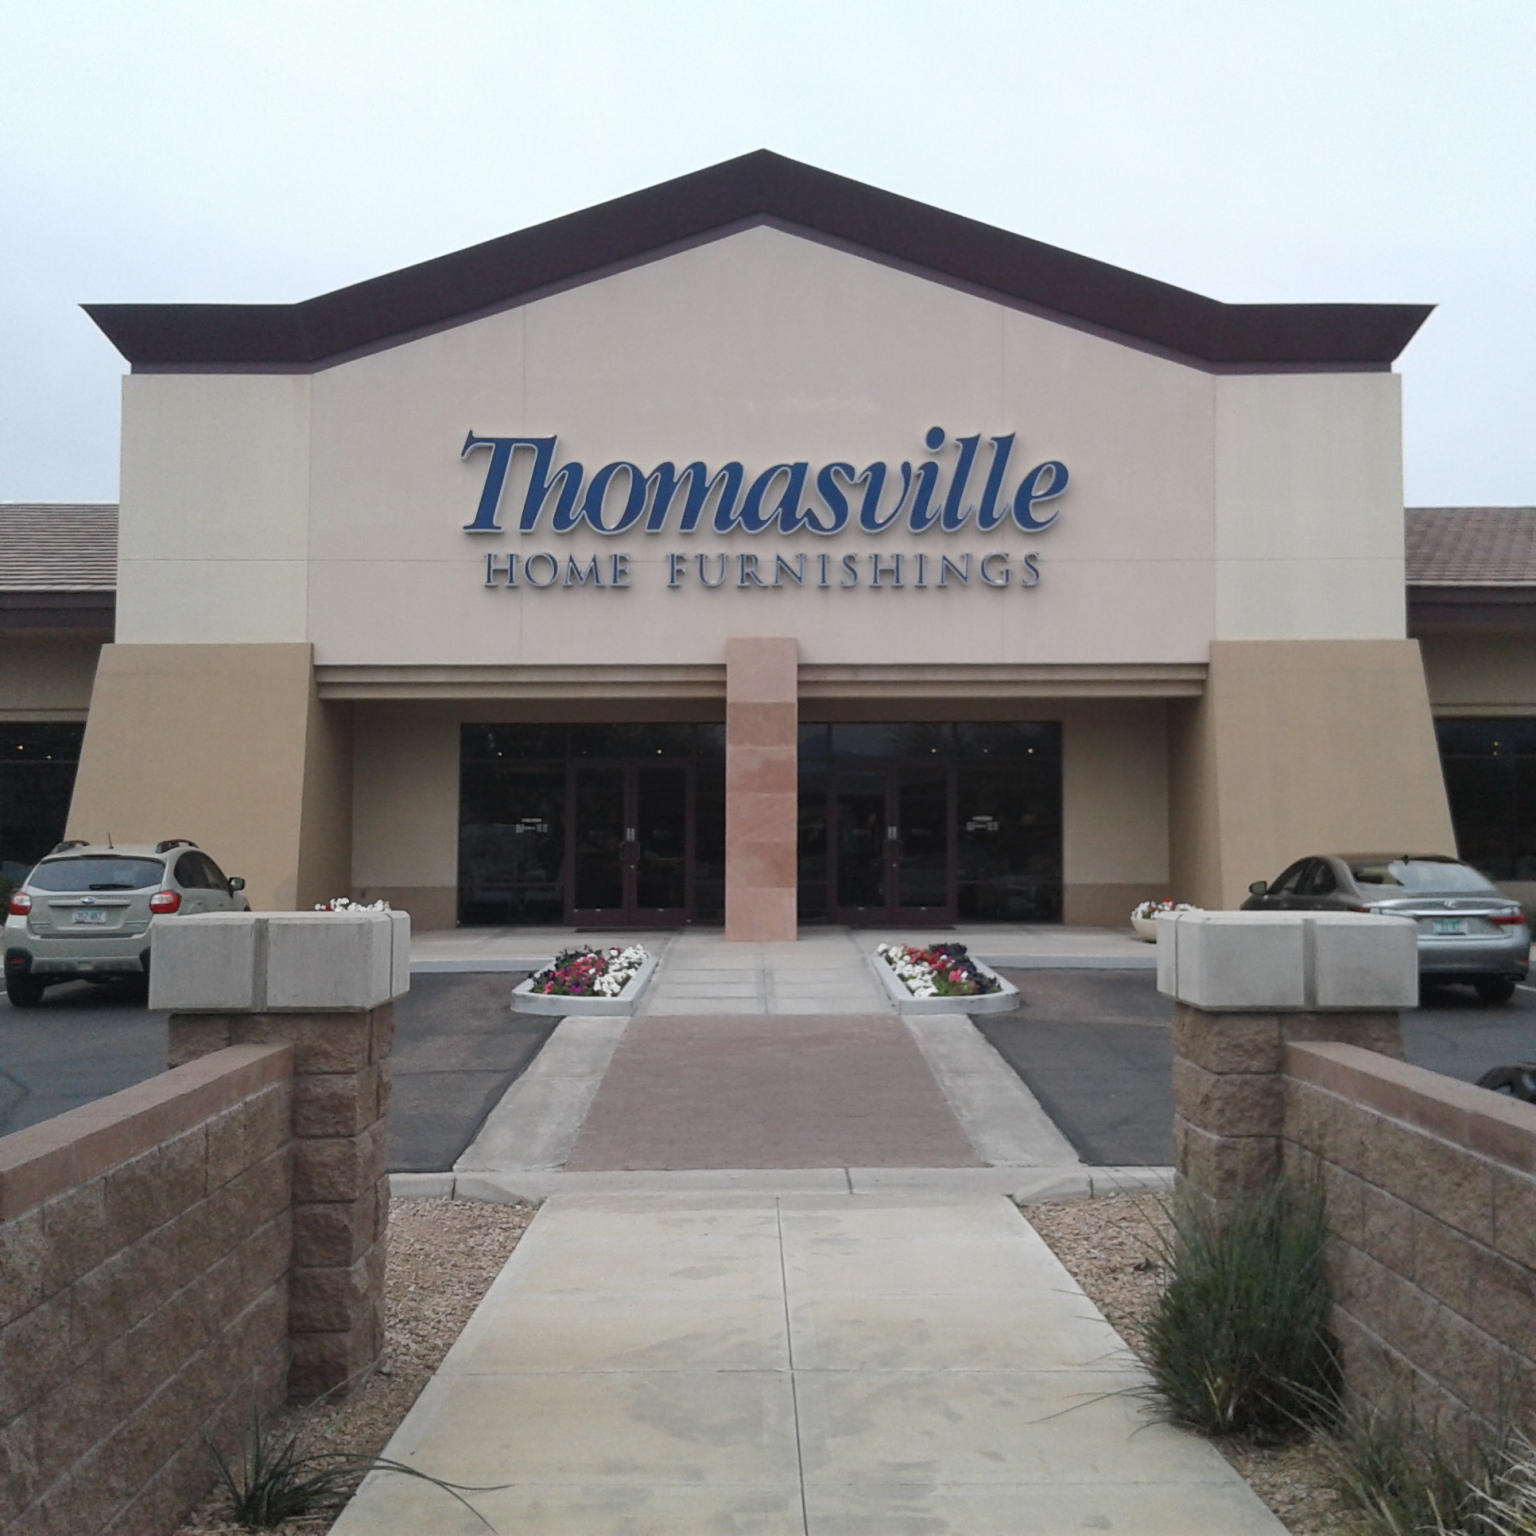 Thomasville Home Furnishings Of Scottsdale 15630 N Rd Az 85254 Yp